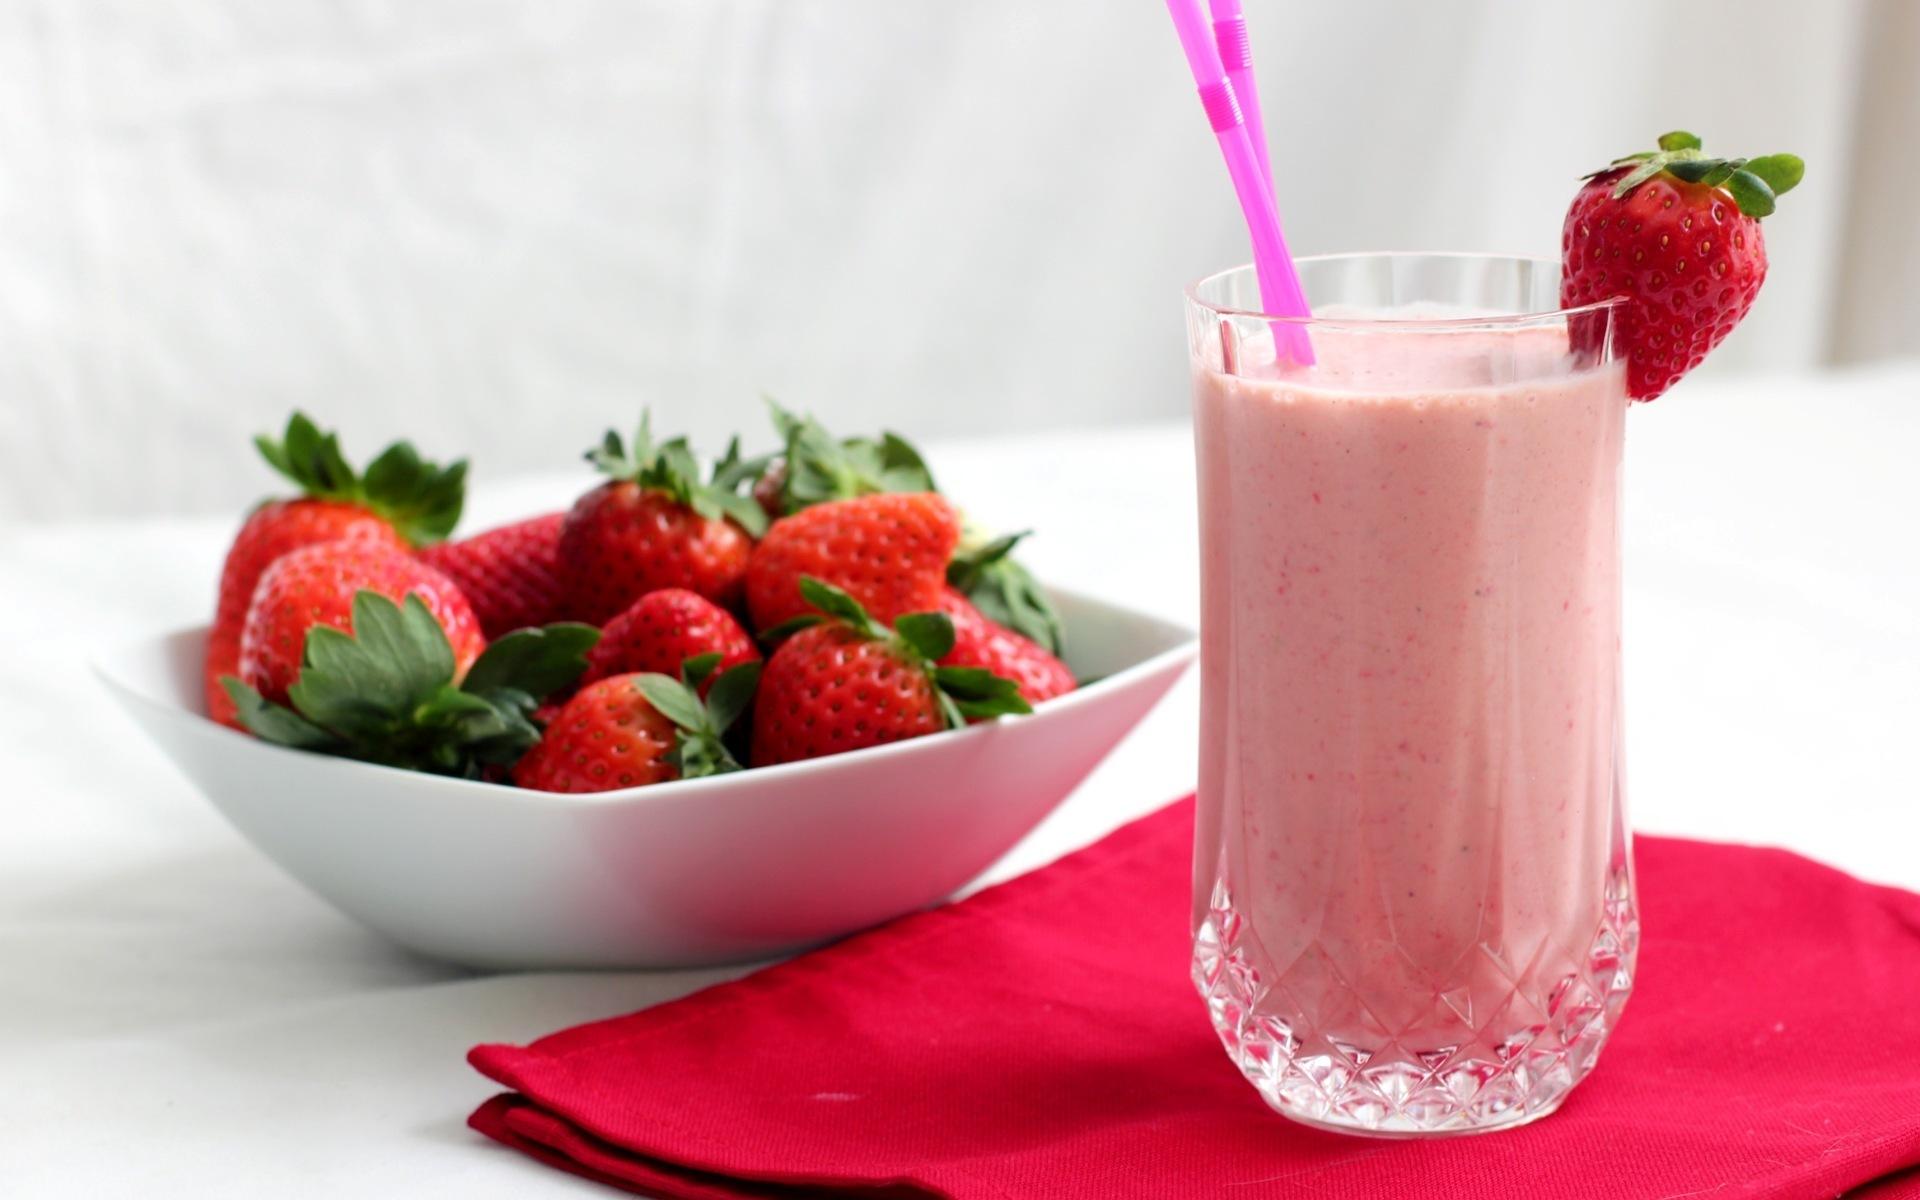 Strawberry Juice Wallpaper Photos Wallpaper WallpaperLepi 1920x1200